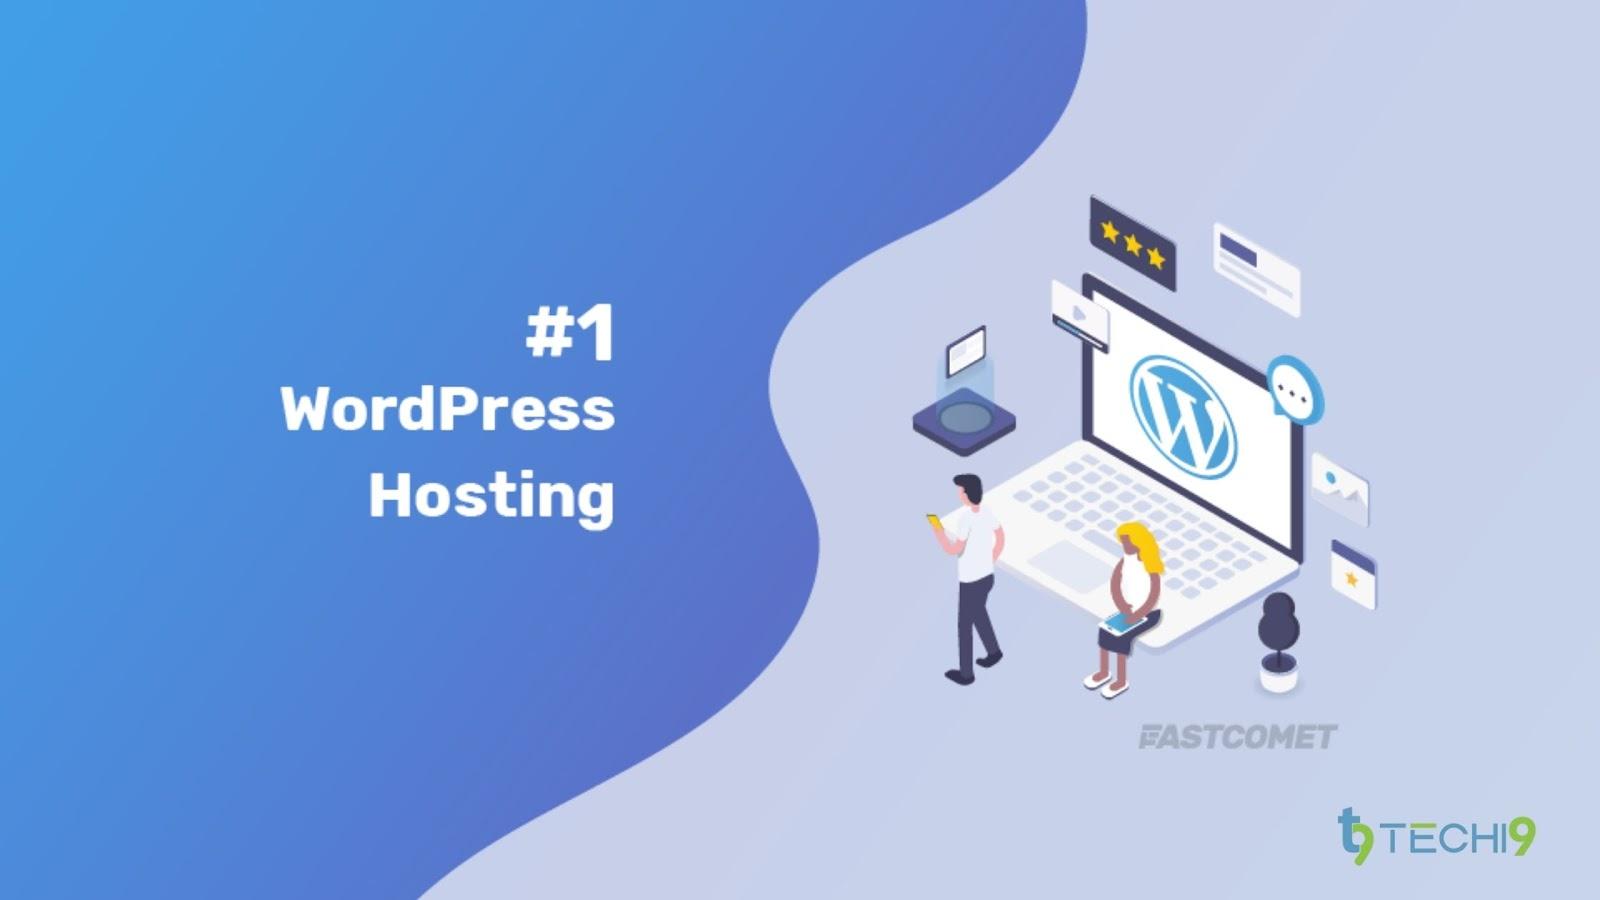 FastComet #1 WordPress Hosting Service